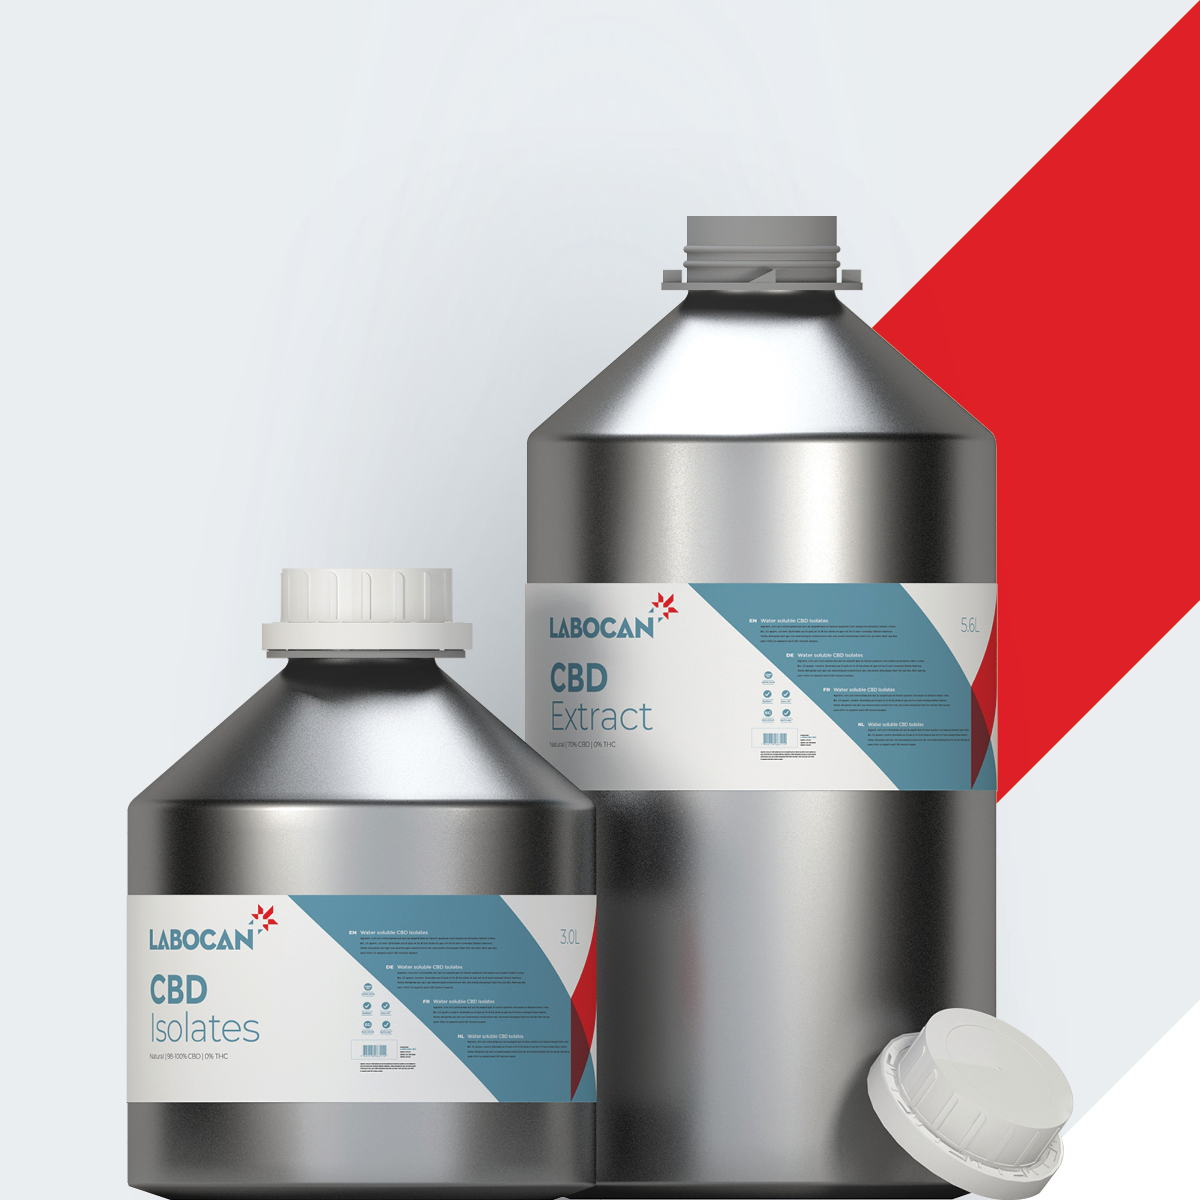 CBD Isolates and CBD Extract